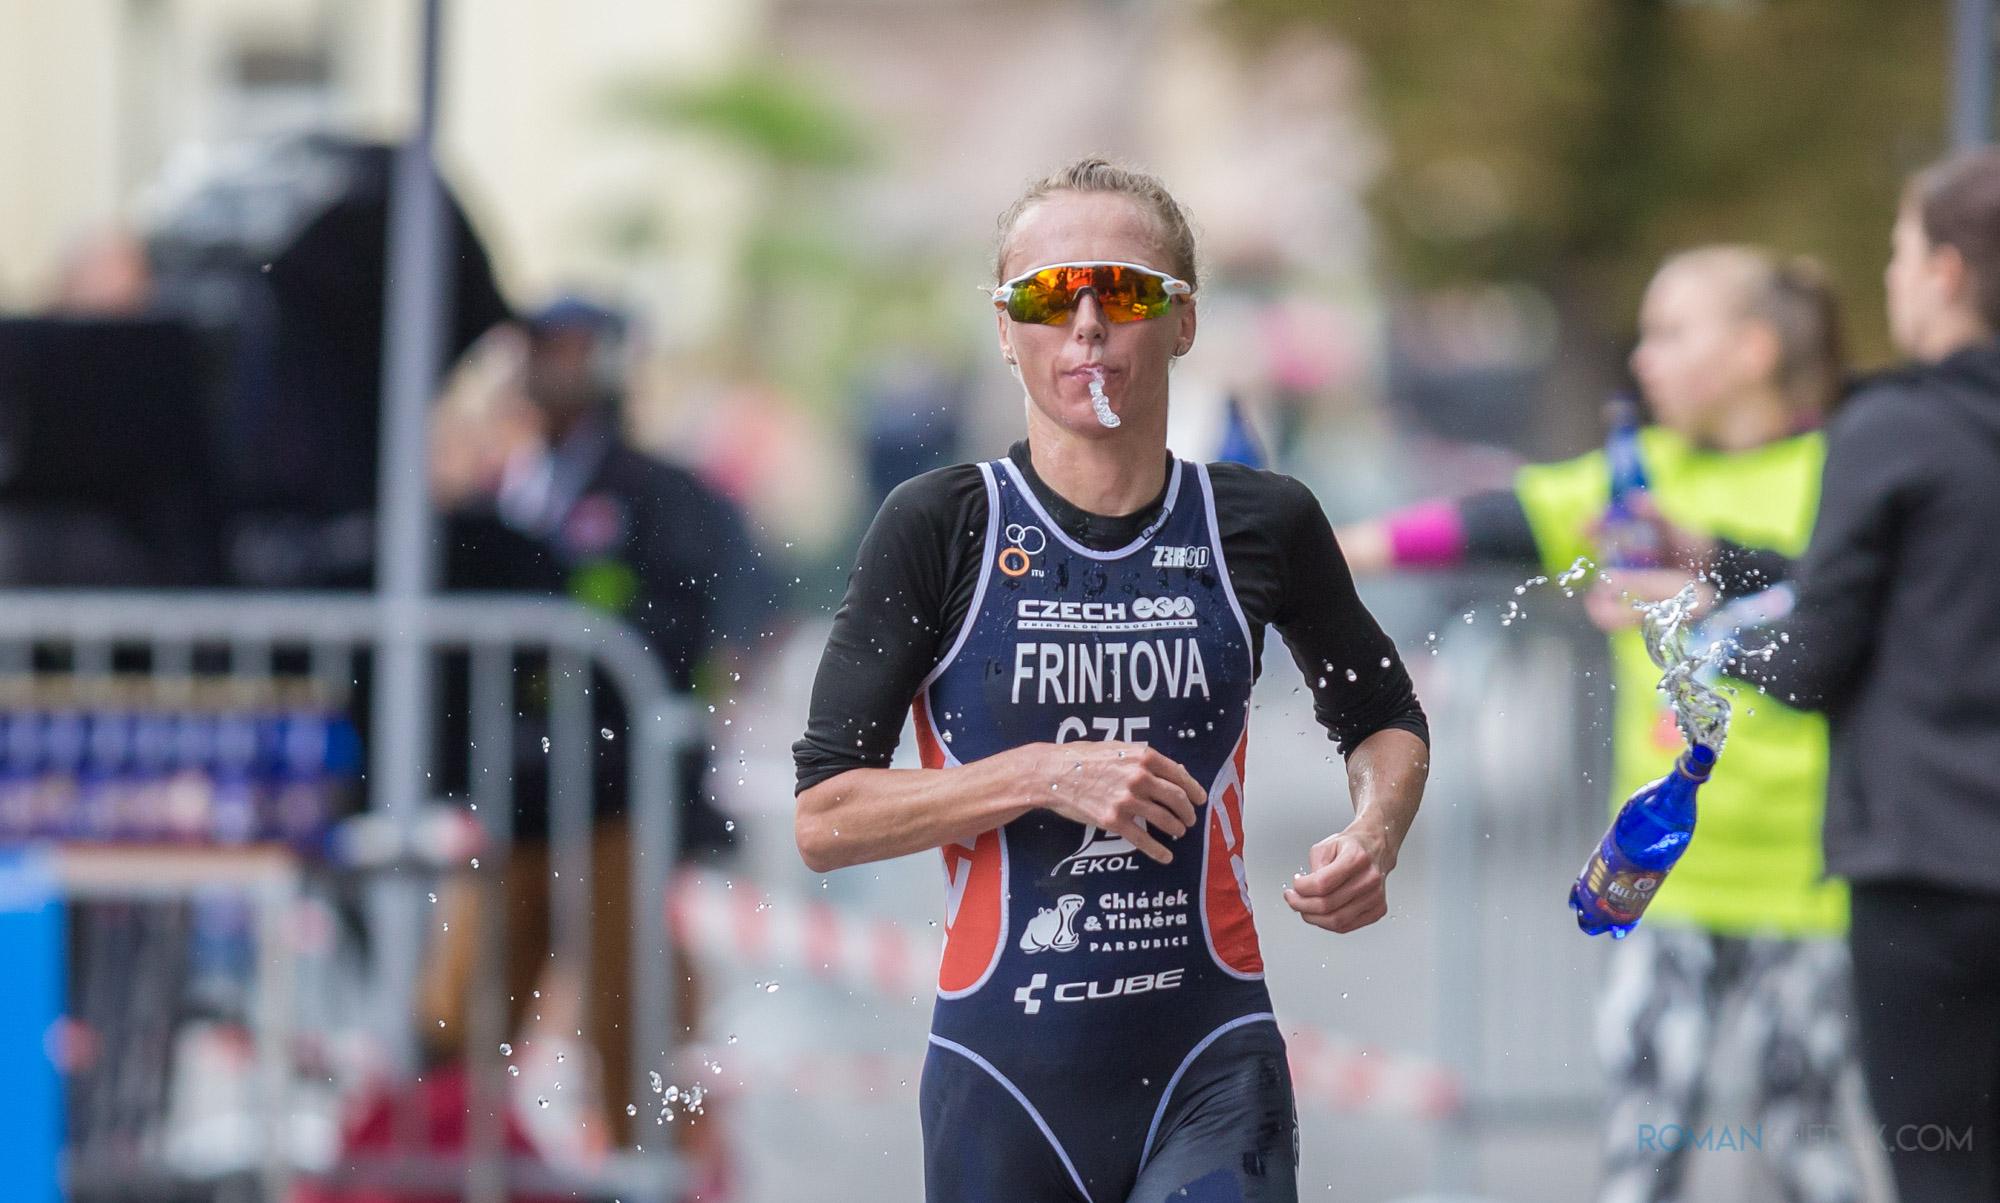 ICU_World_Cup_Triathlon_KV-30